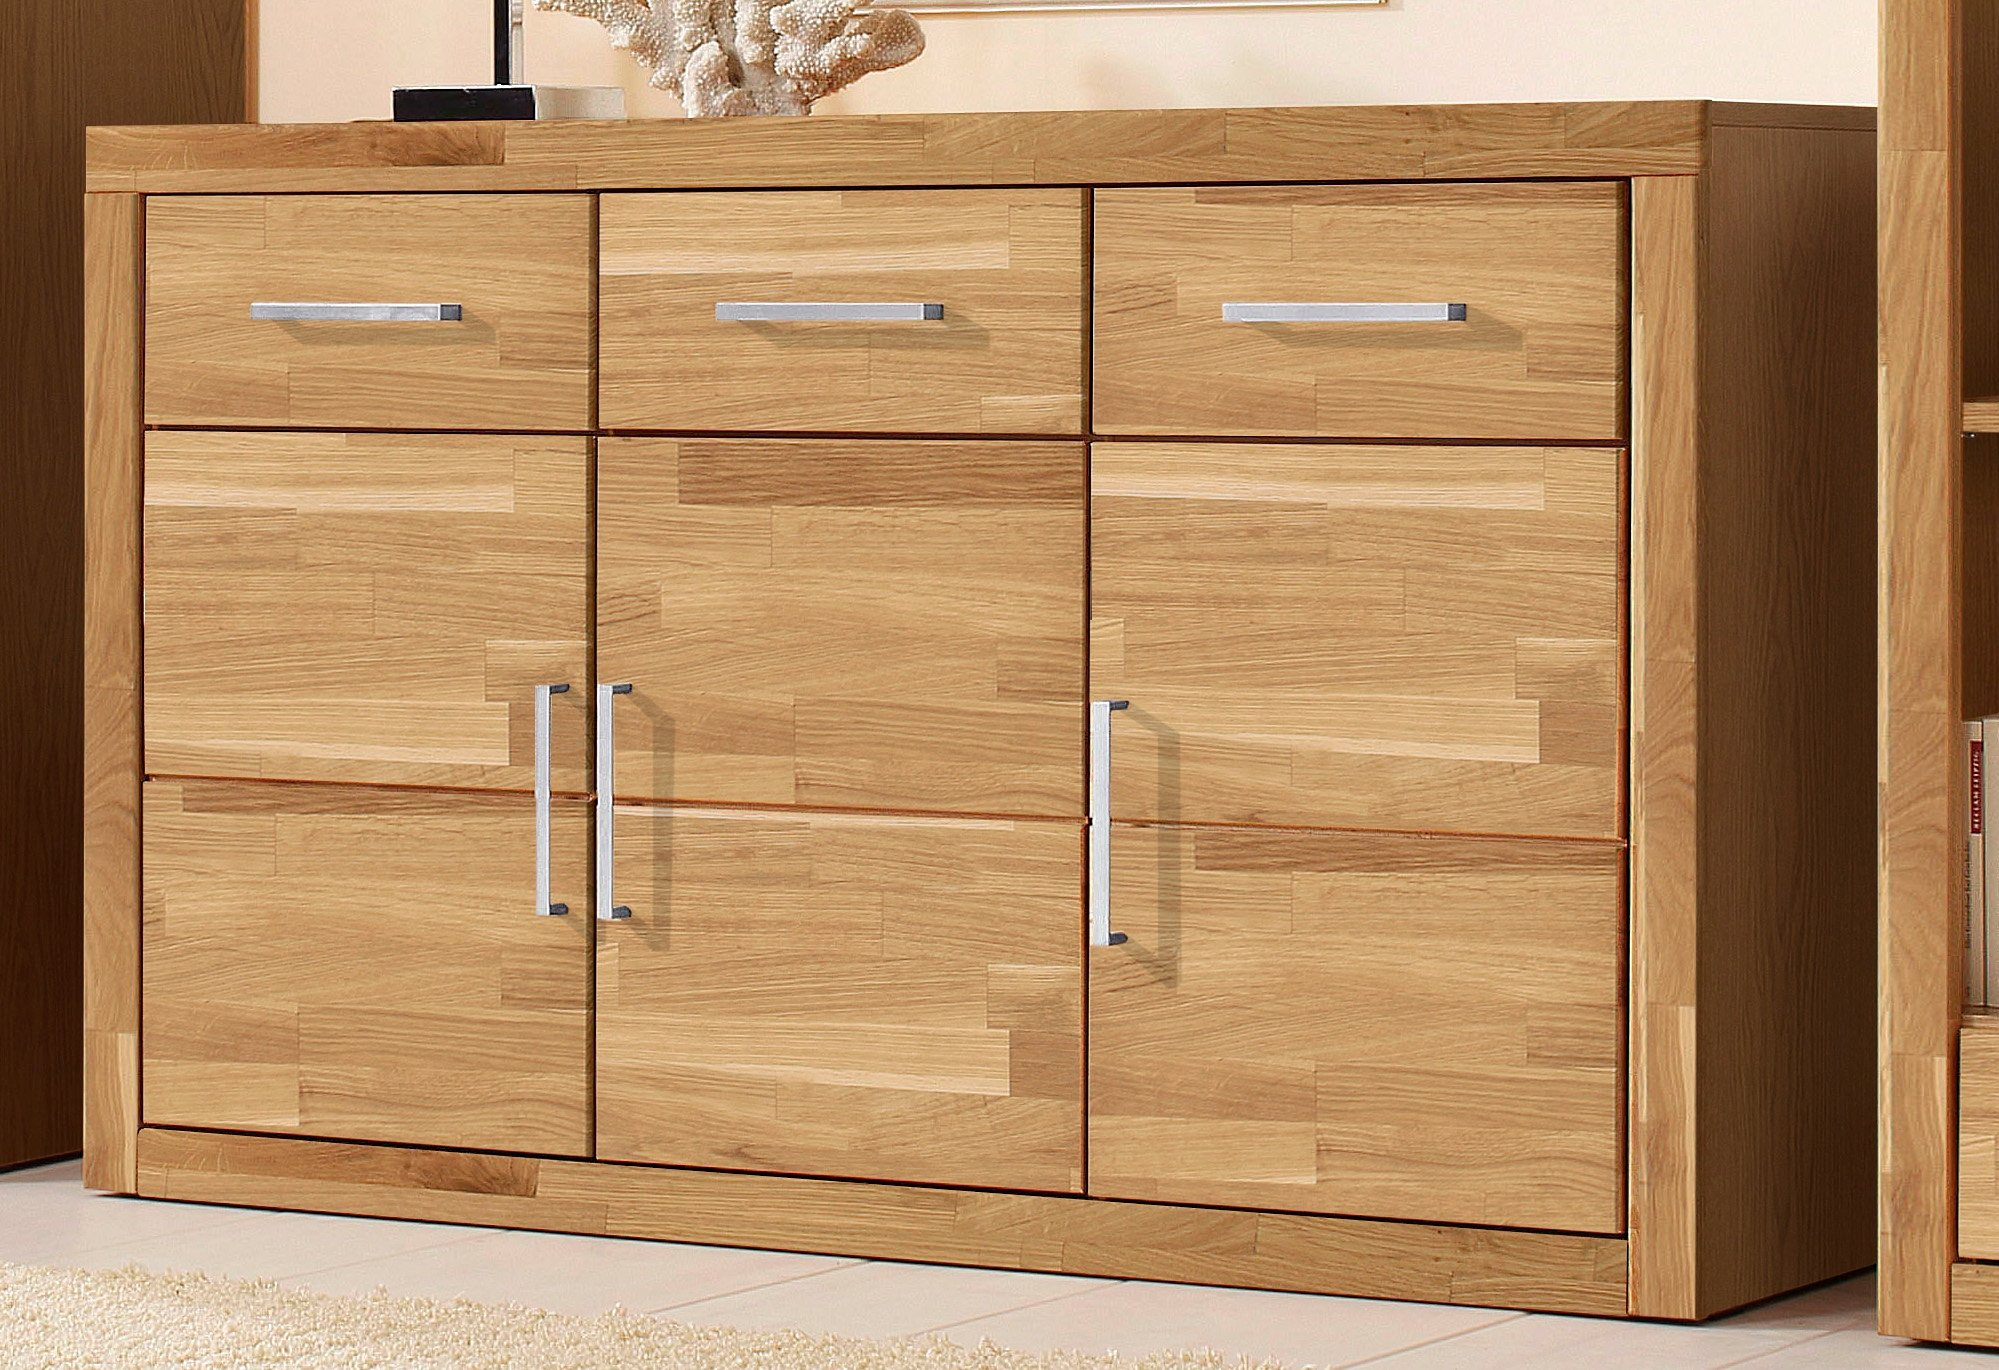 sideboard 130 cm breit sideboard breite cm with sideboard. Black Bedroom Furniture Sets. Home Design Ideas